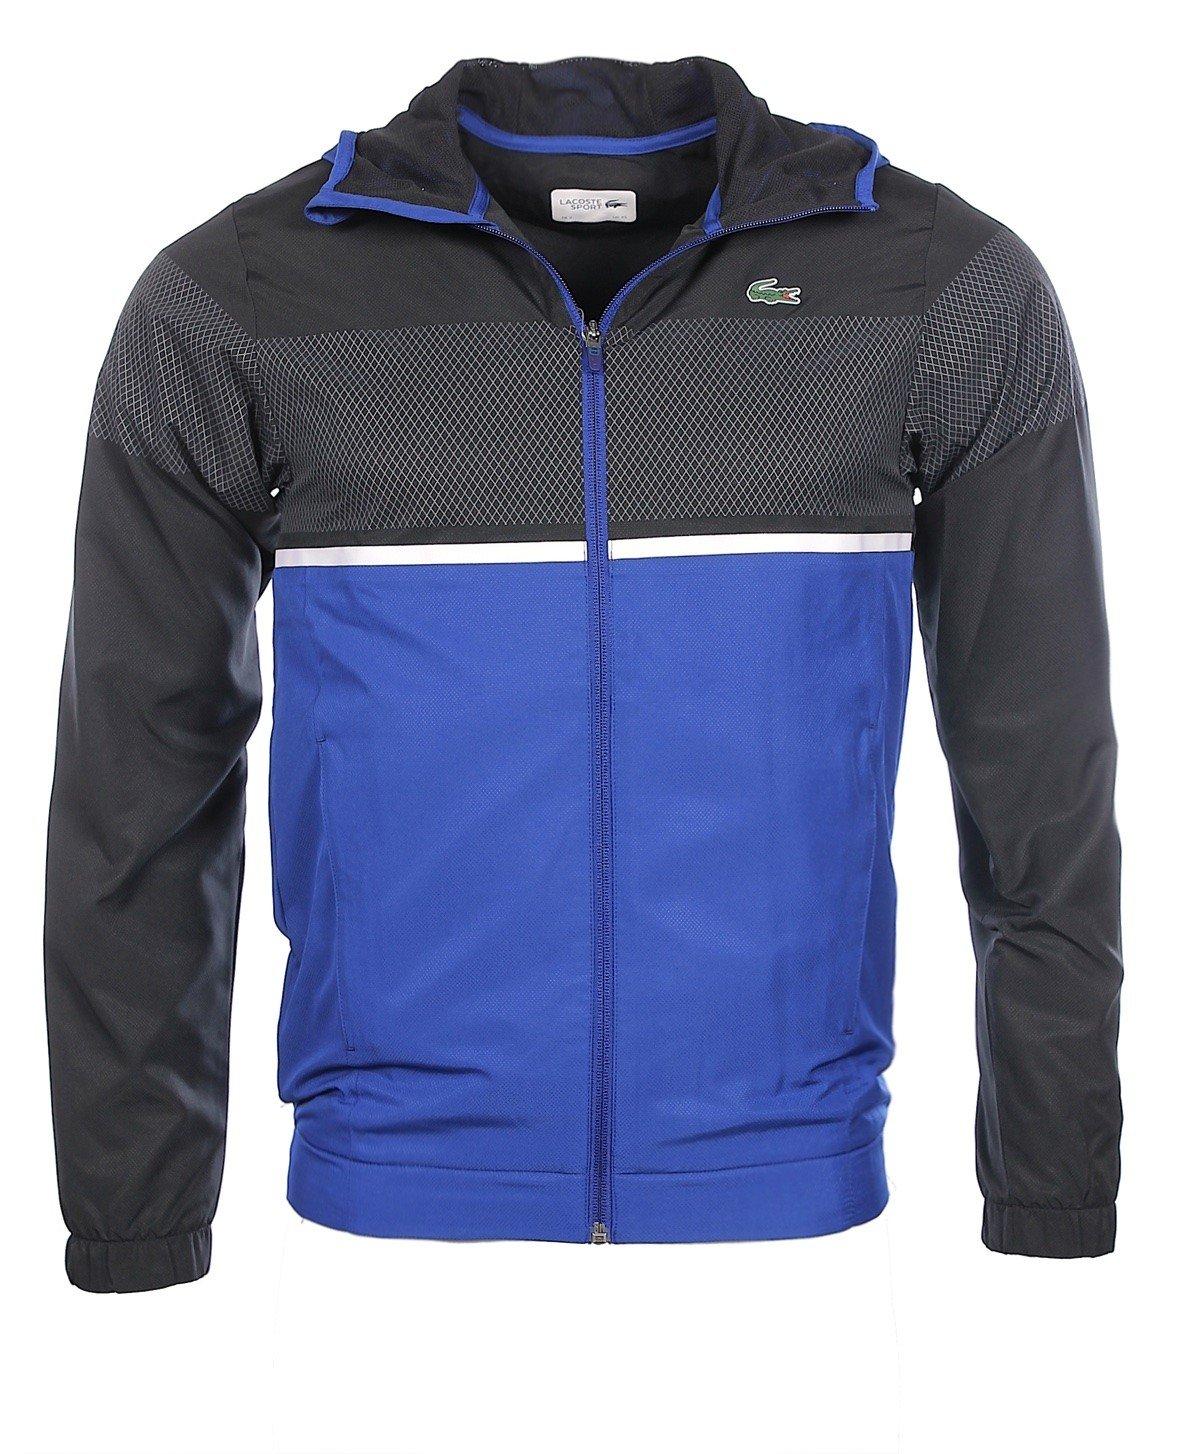 Lacoste Sport Chándal para hombre, blau - schwarz - weiß, 2 ...